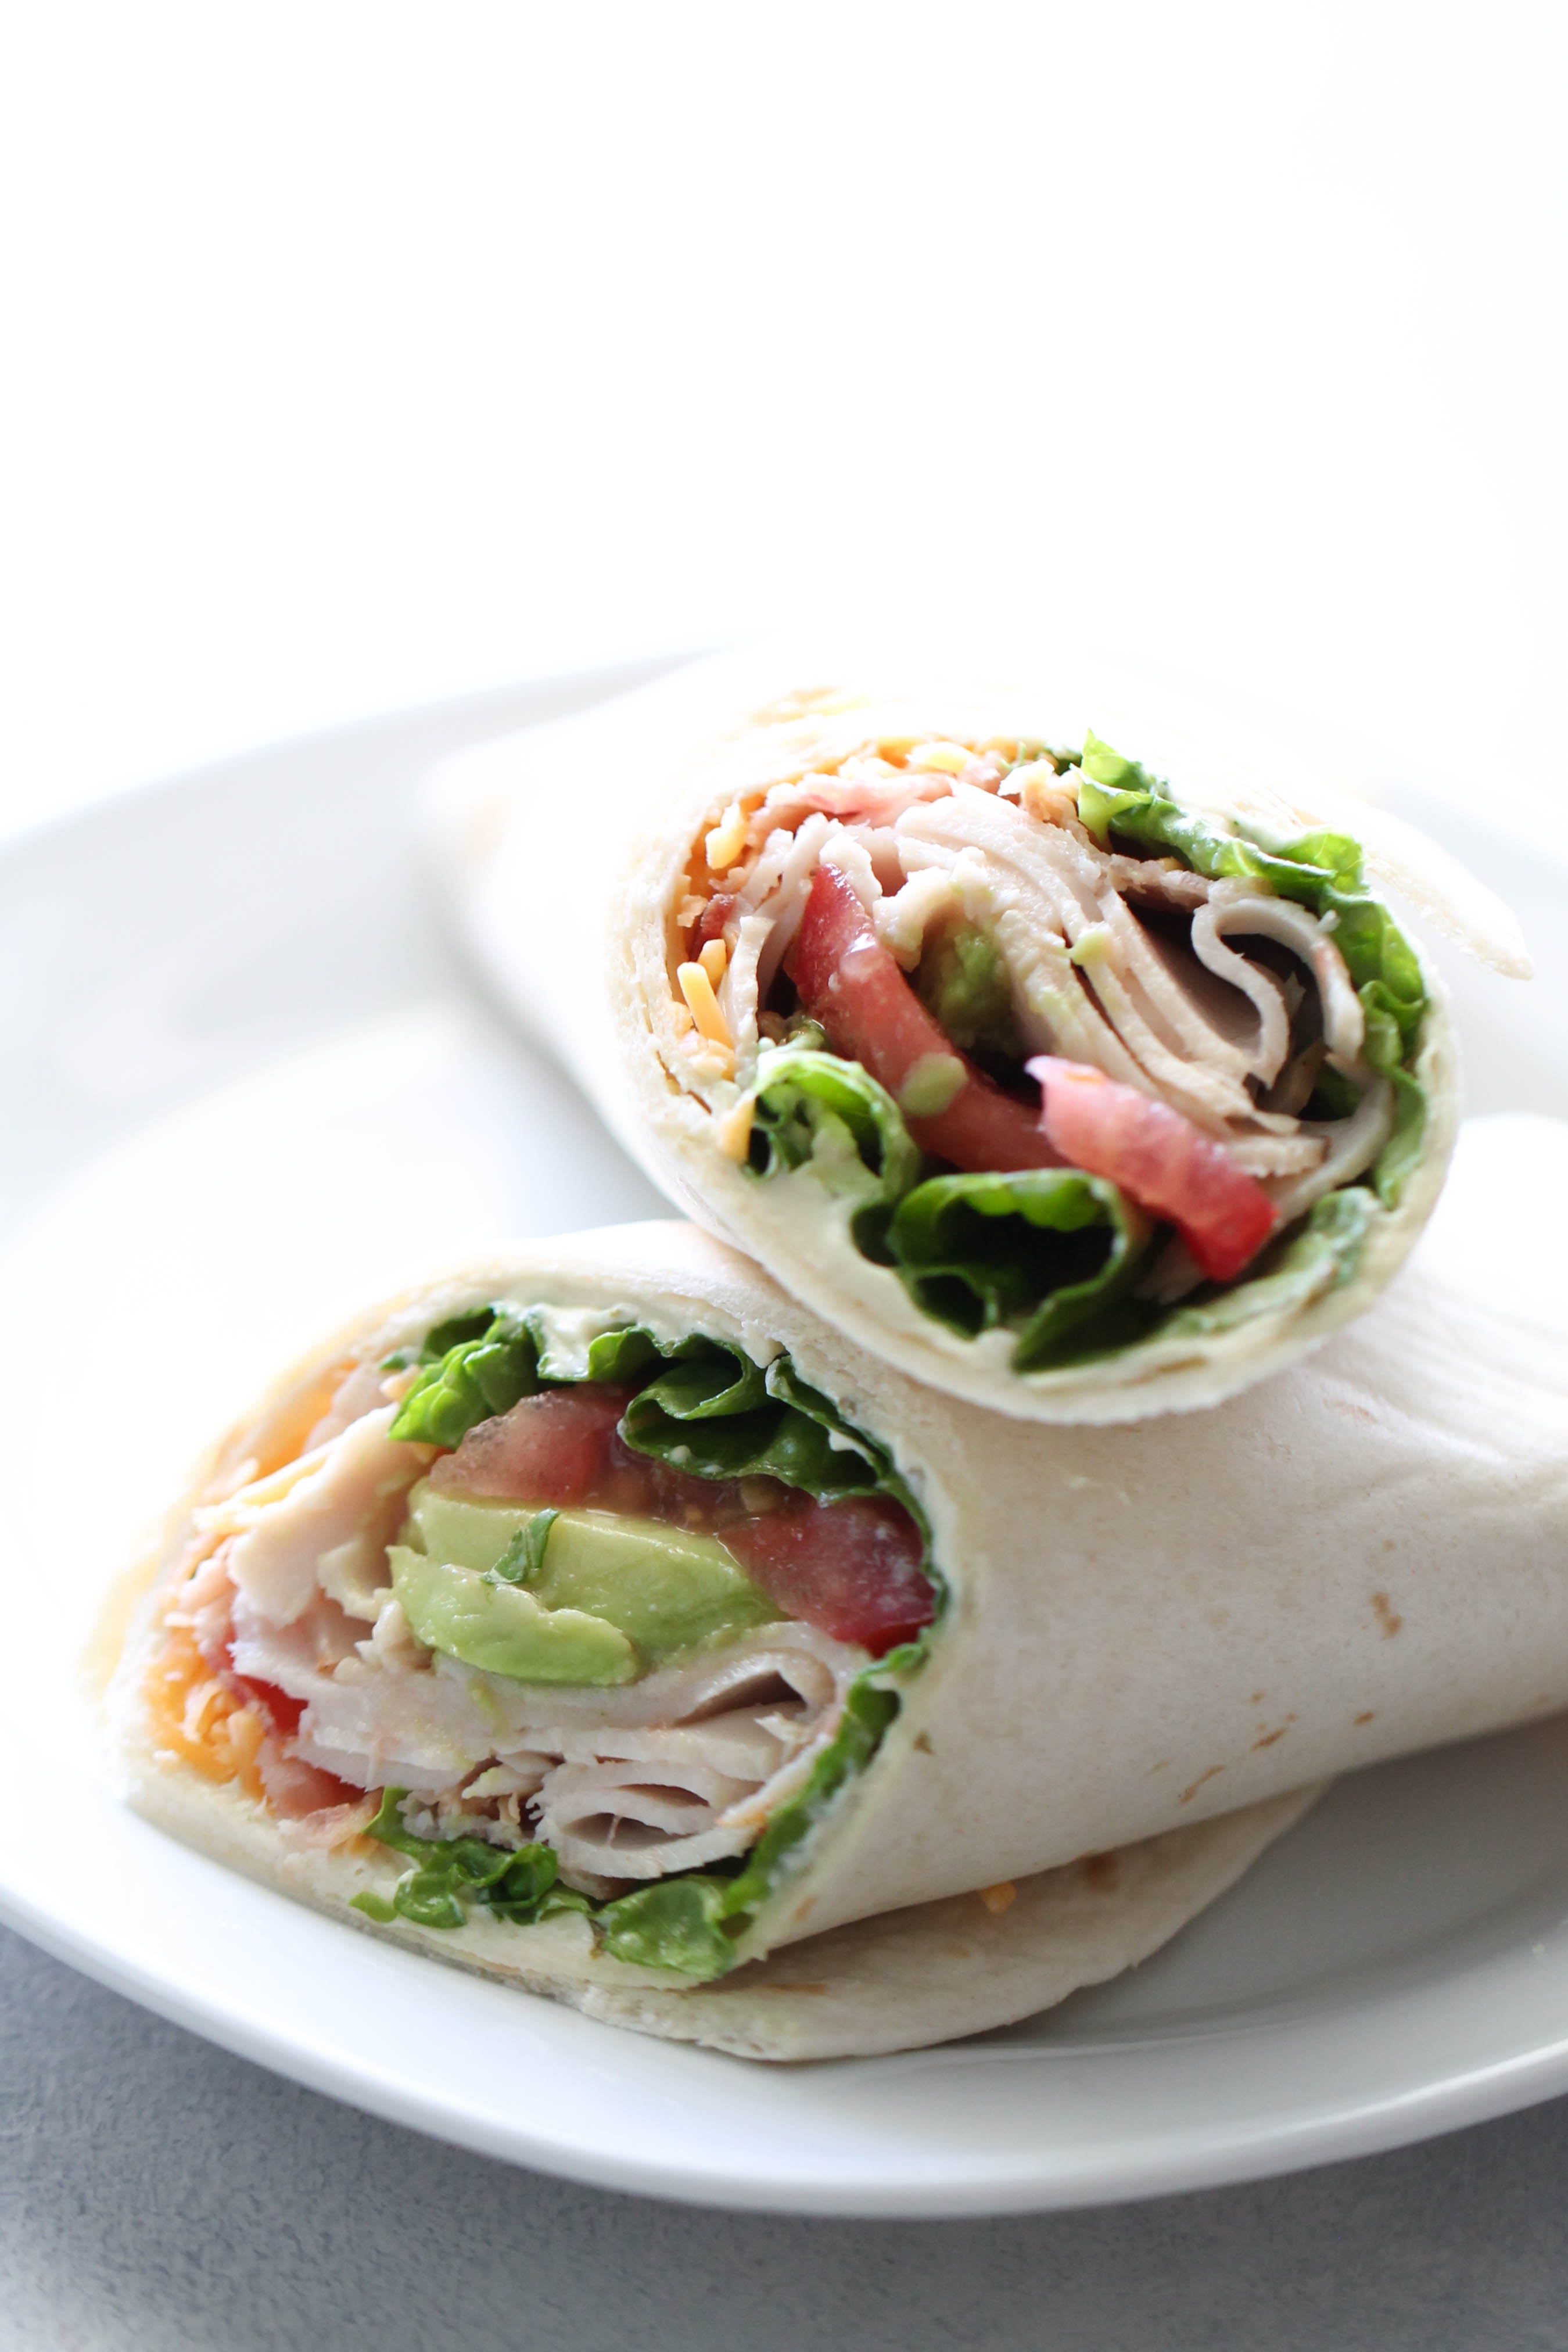 Turkey Bacon Avocado Wraps Recipe